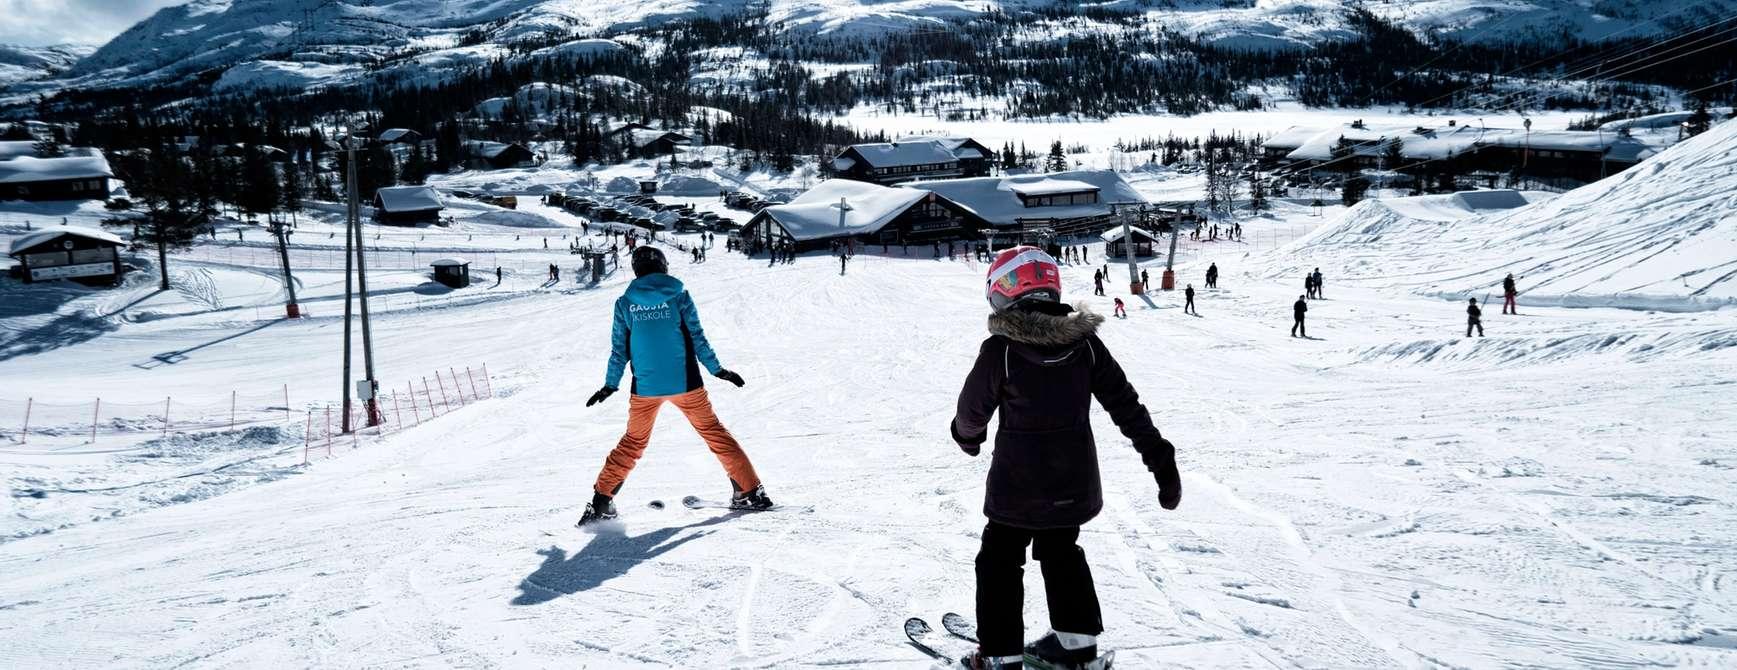 Foto: Gausta Skicenter Skiskole